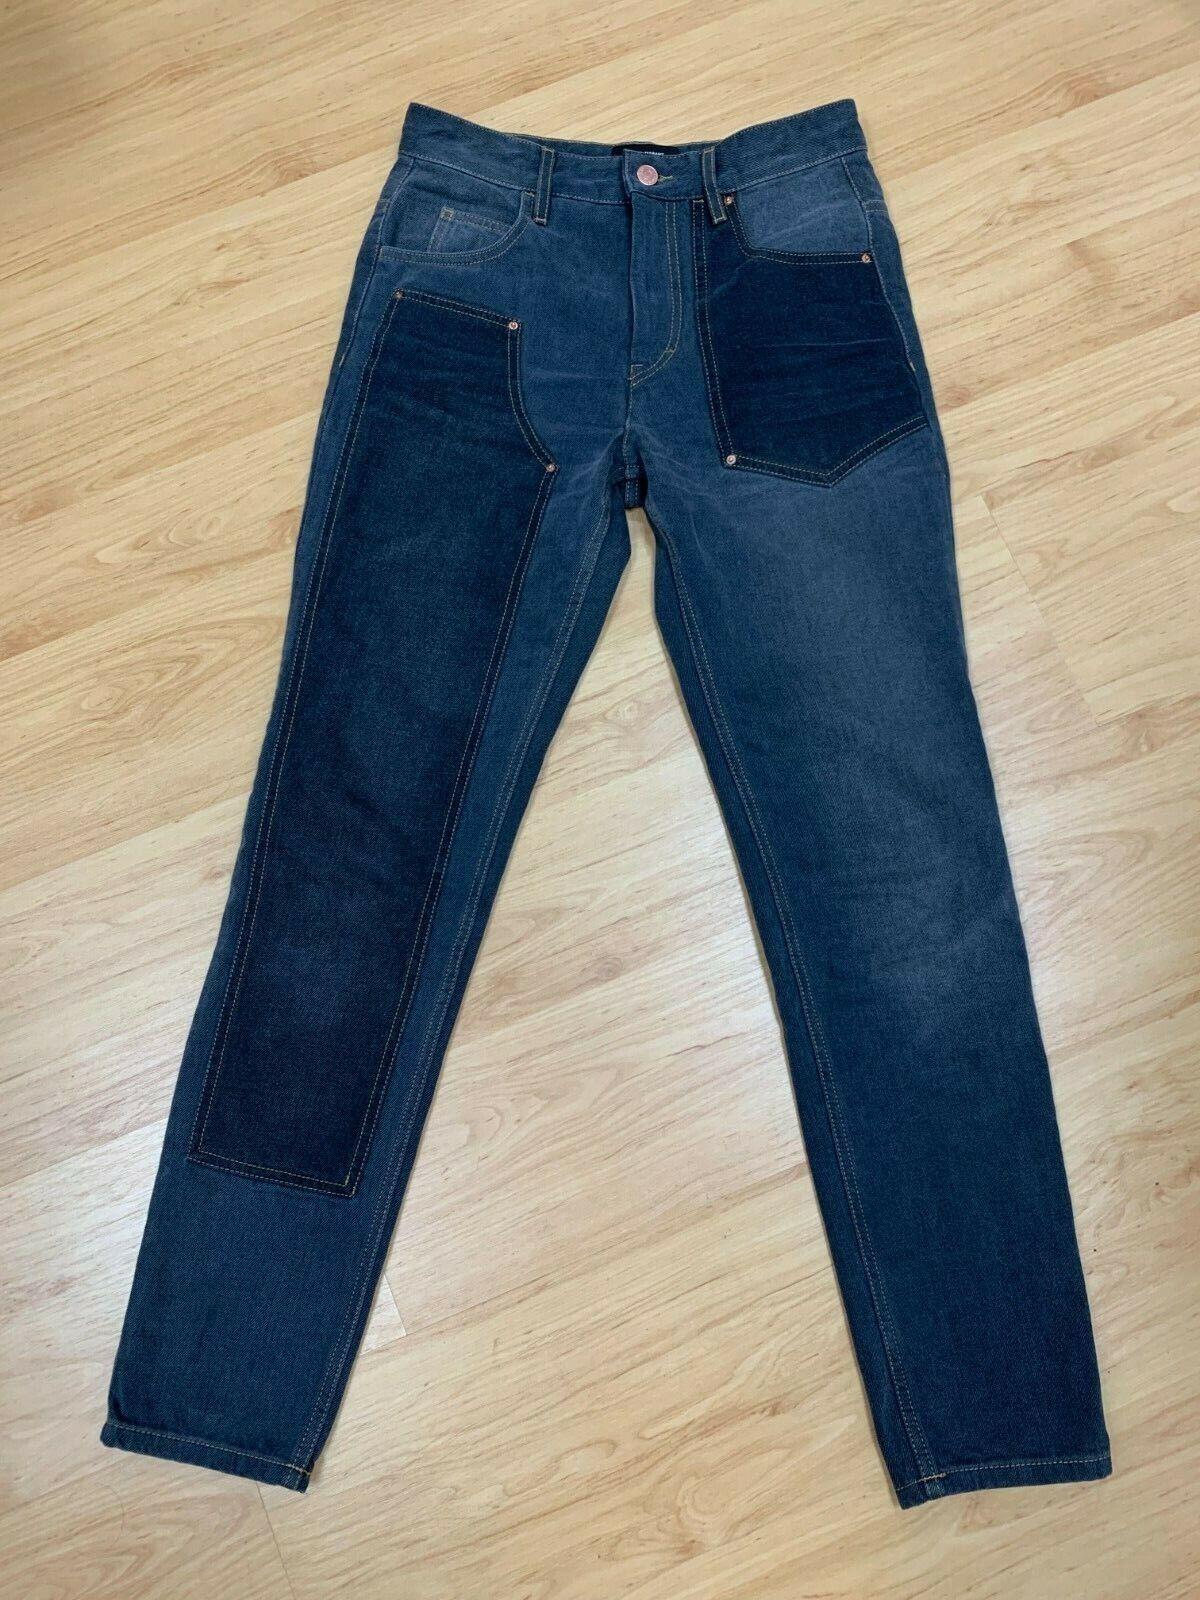 ISABEL MARANT Orrick makoré HIGH-RISE SLIM LEG JEANS noir taille 36 FR (4 US)